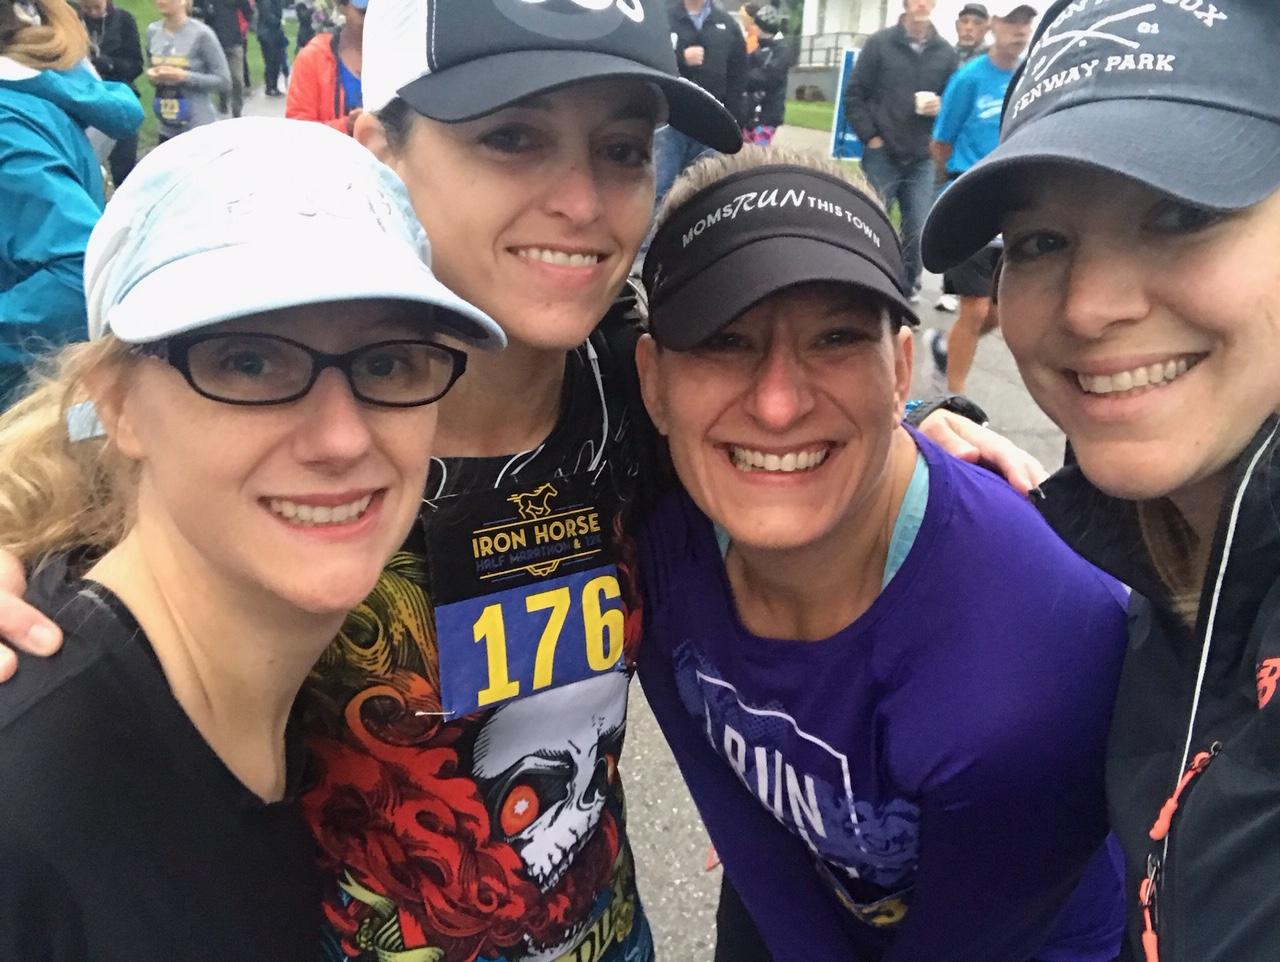 Iron Horse Half Marathon: Review and Recap 2018 | Running on Happy